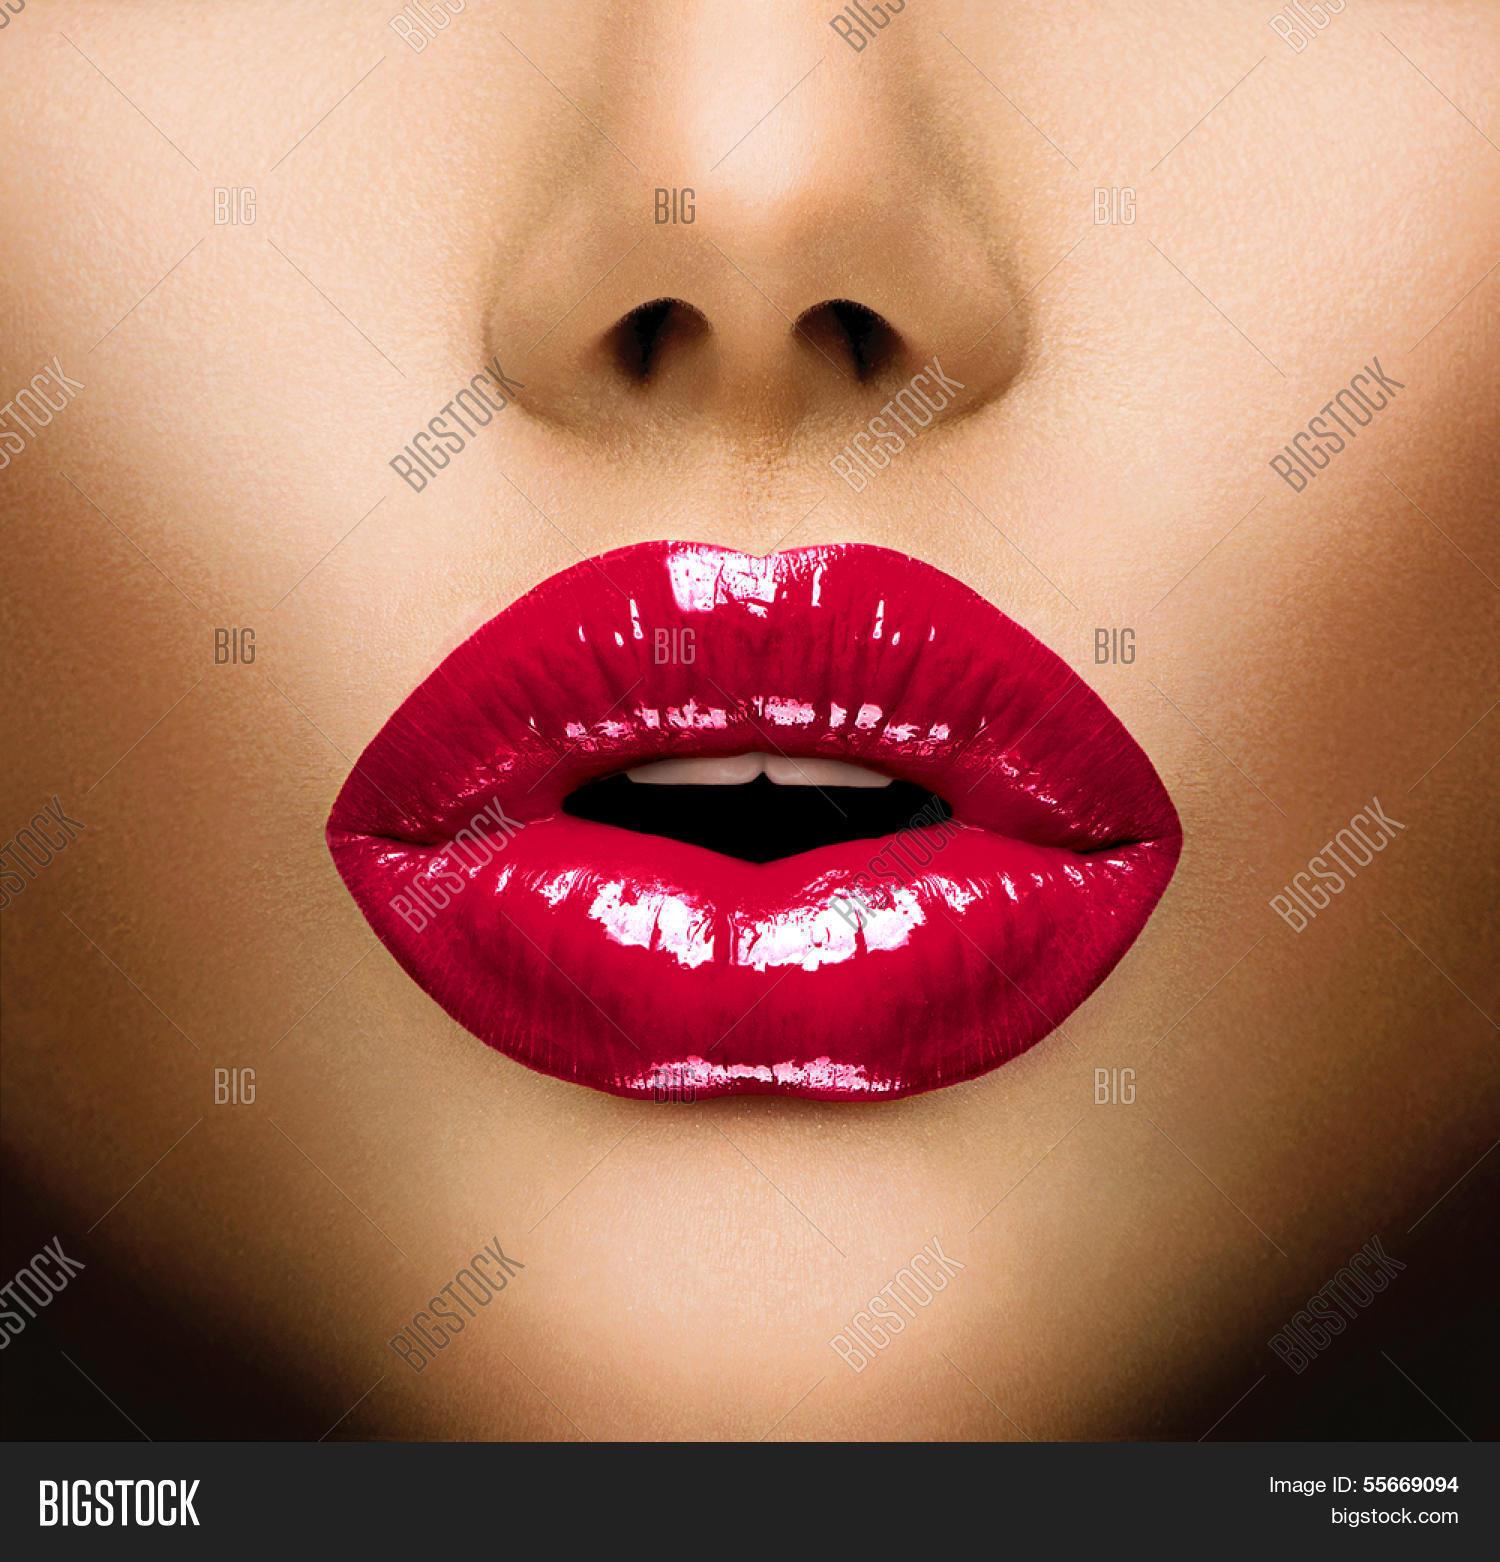 Big Sexy Lips 31